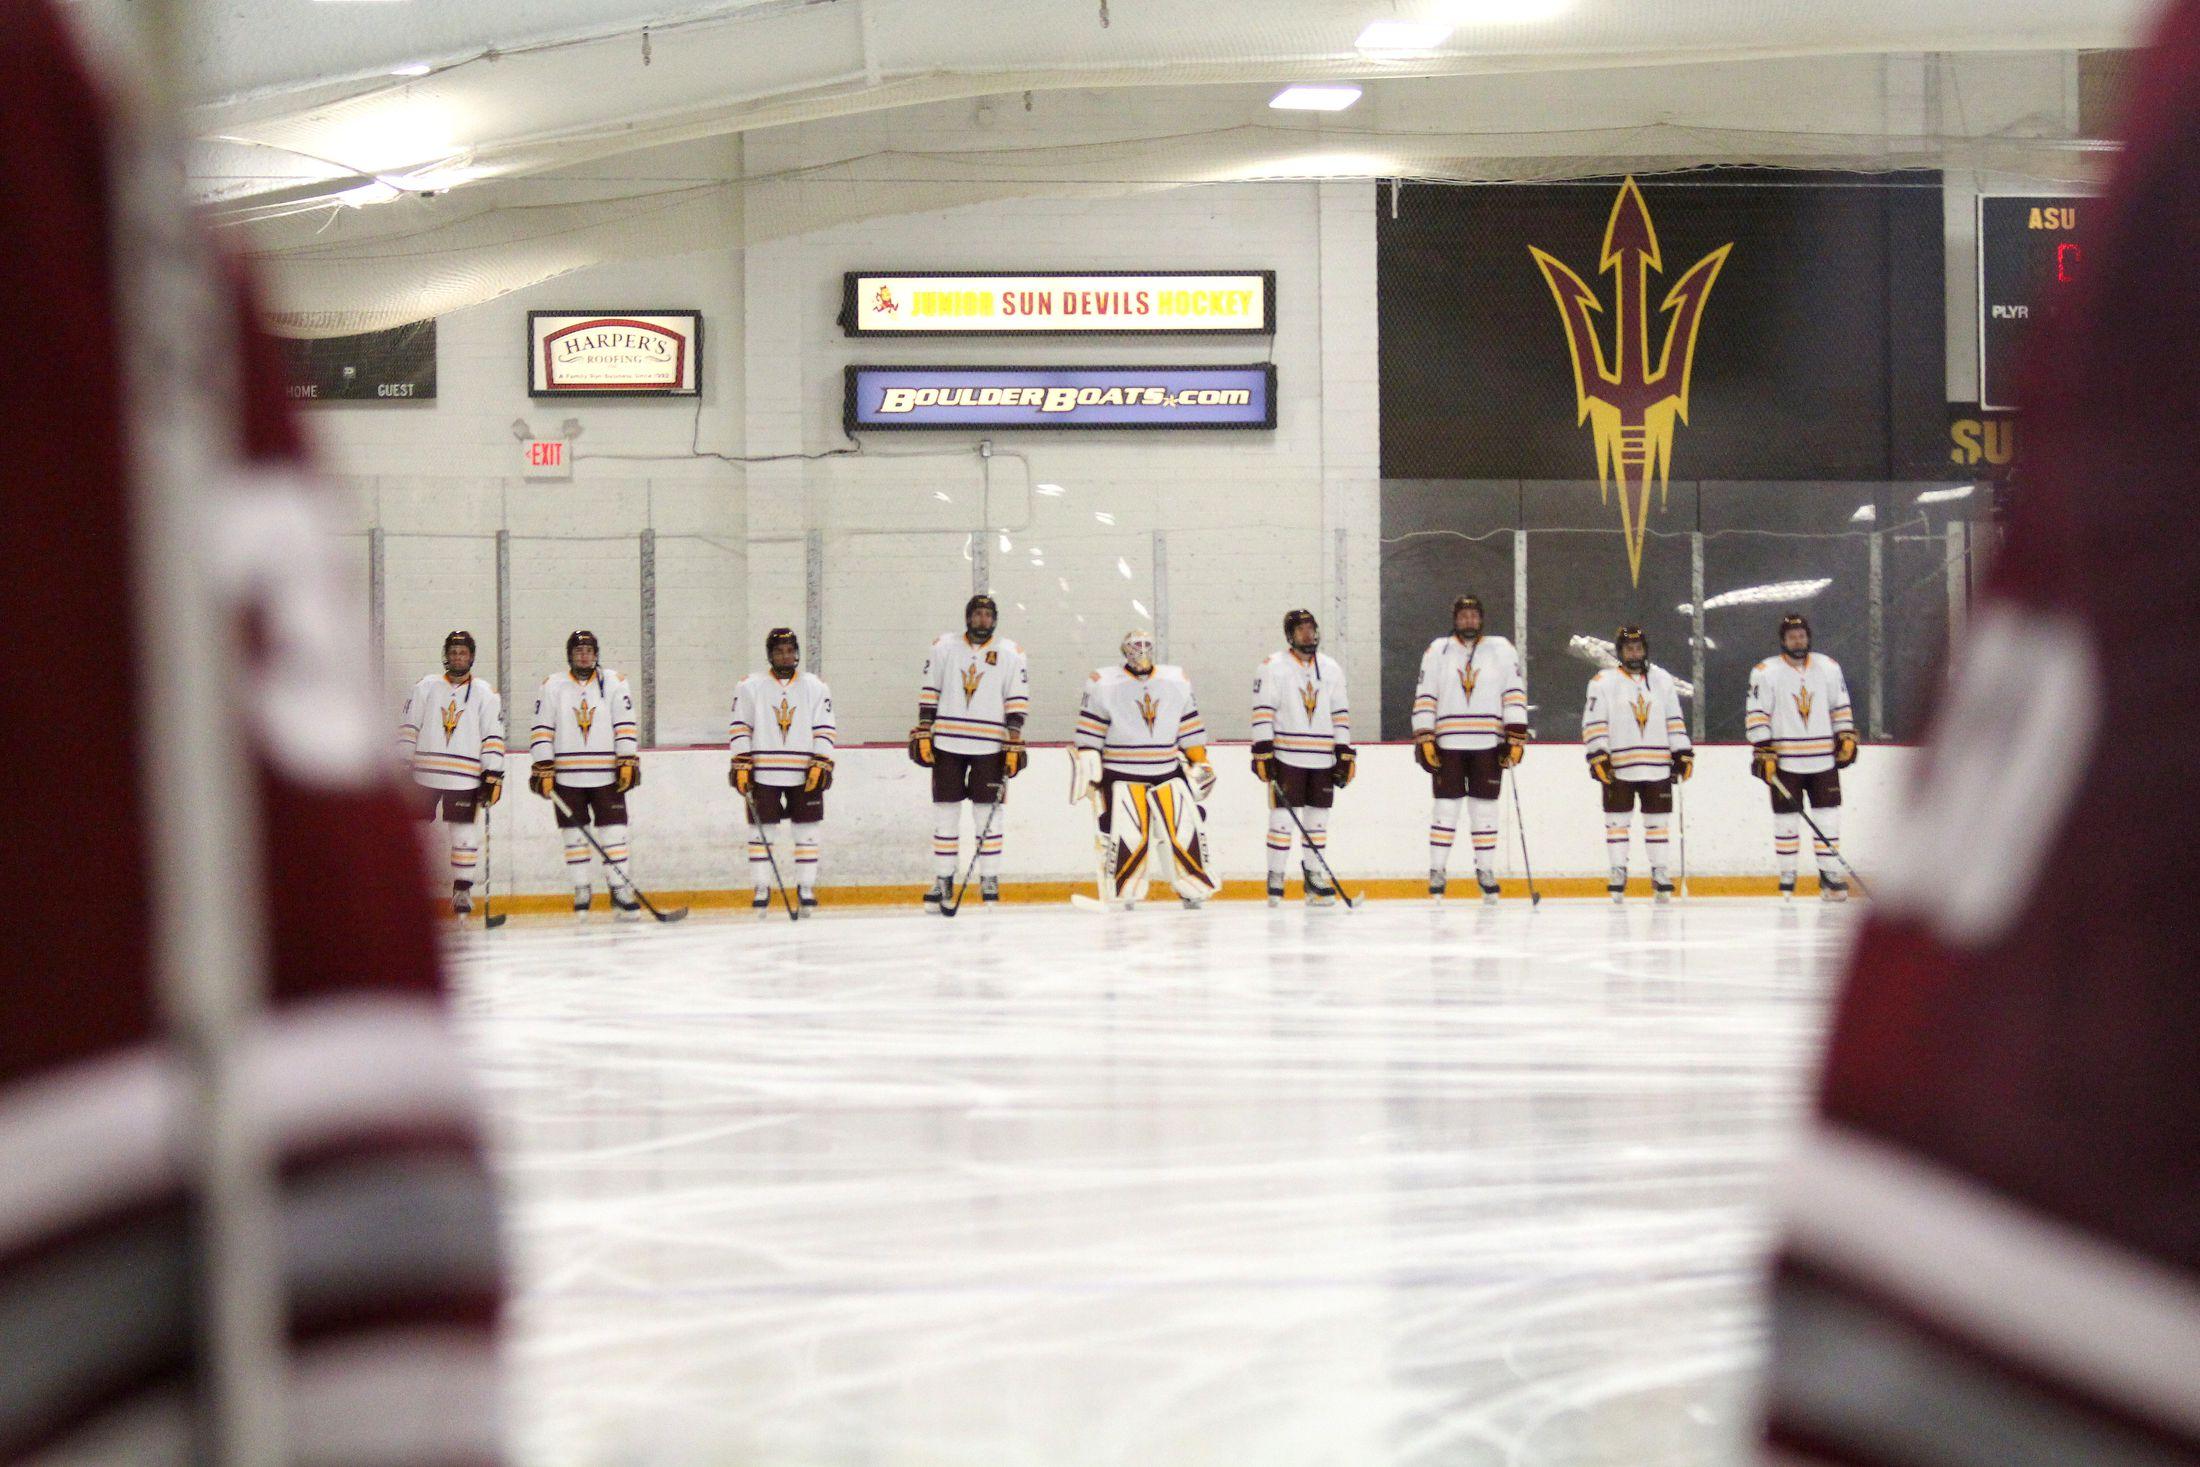 ASU Hockey - Sun Devils Split Home Series With Princeton